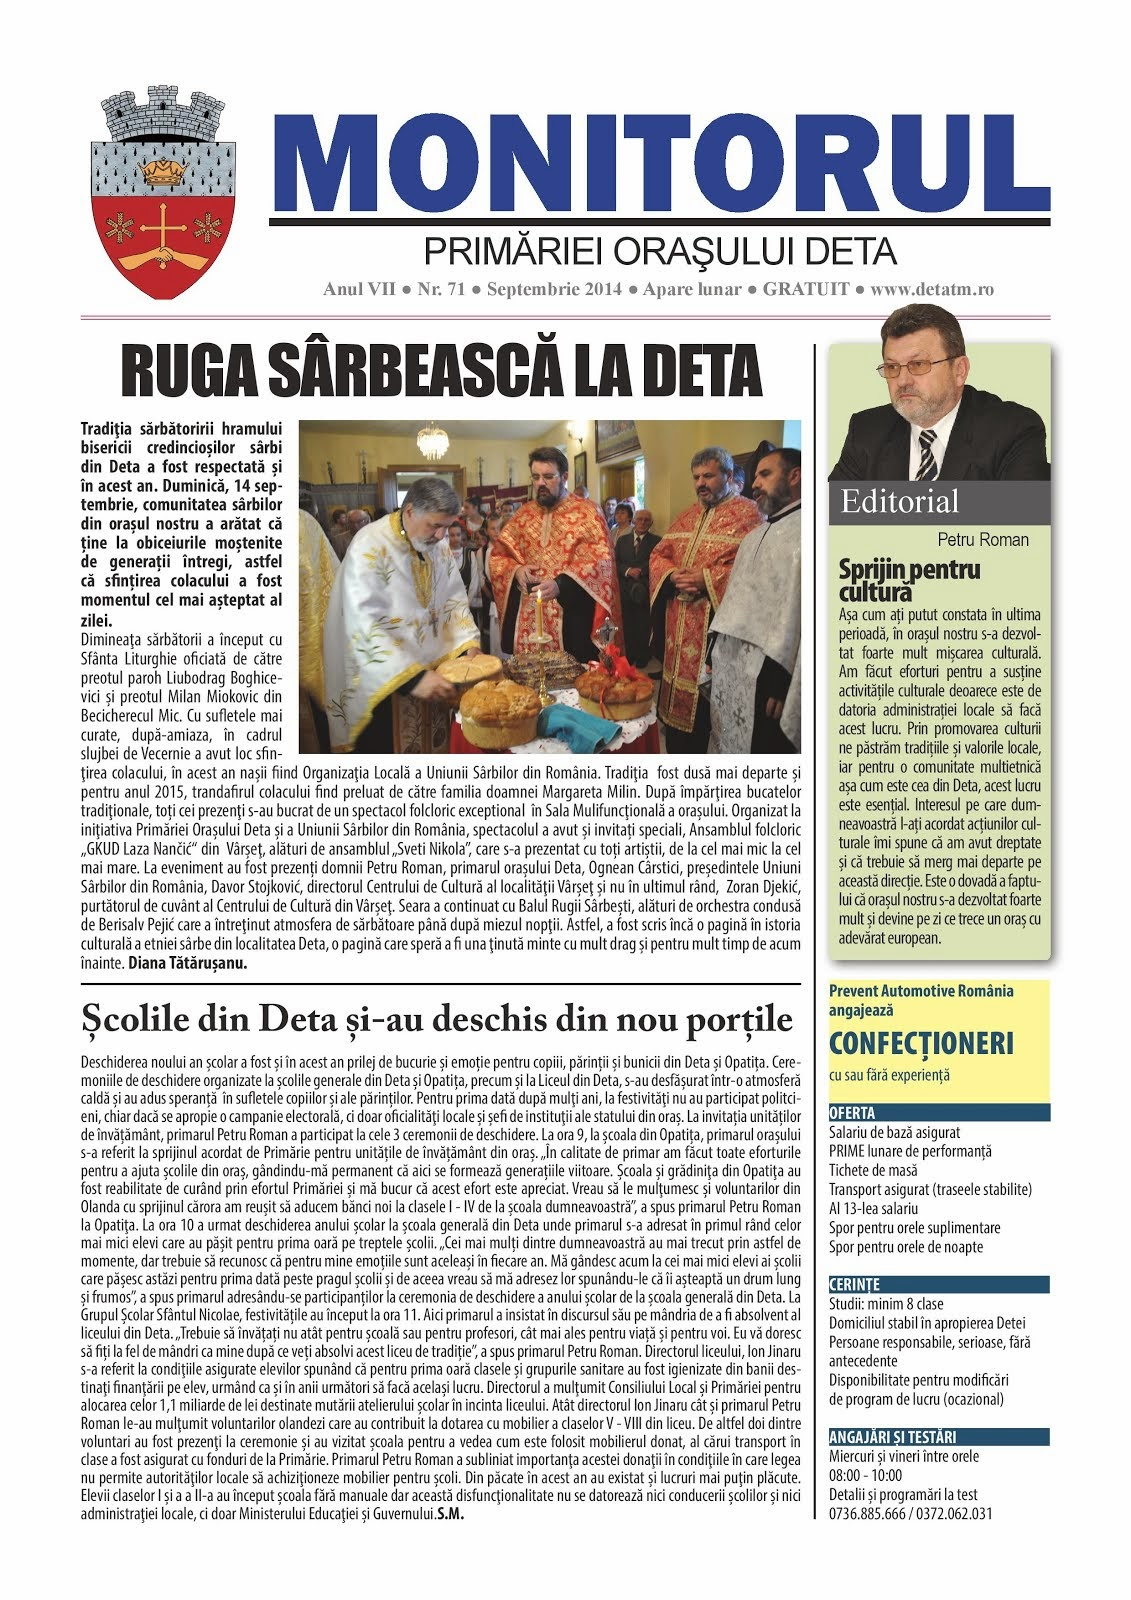 Monitorul - septembrie 2014